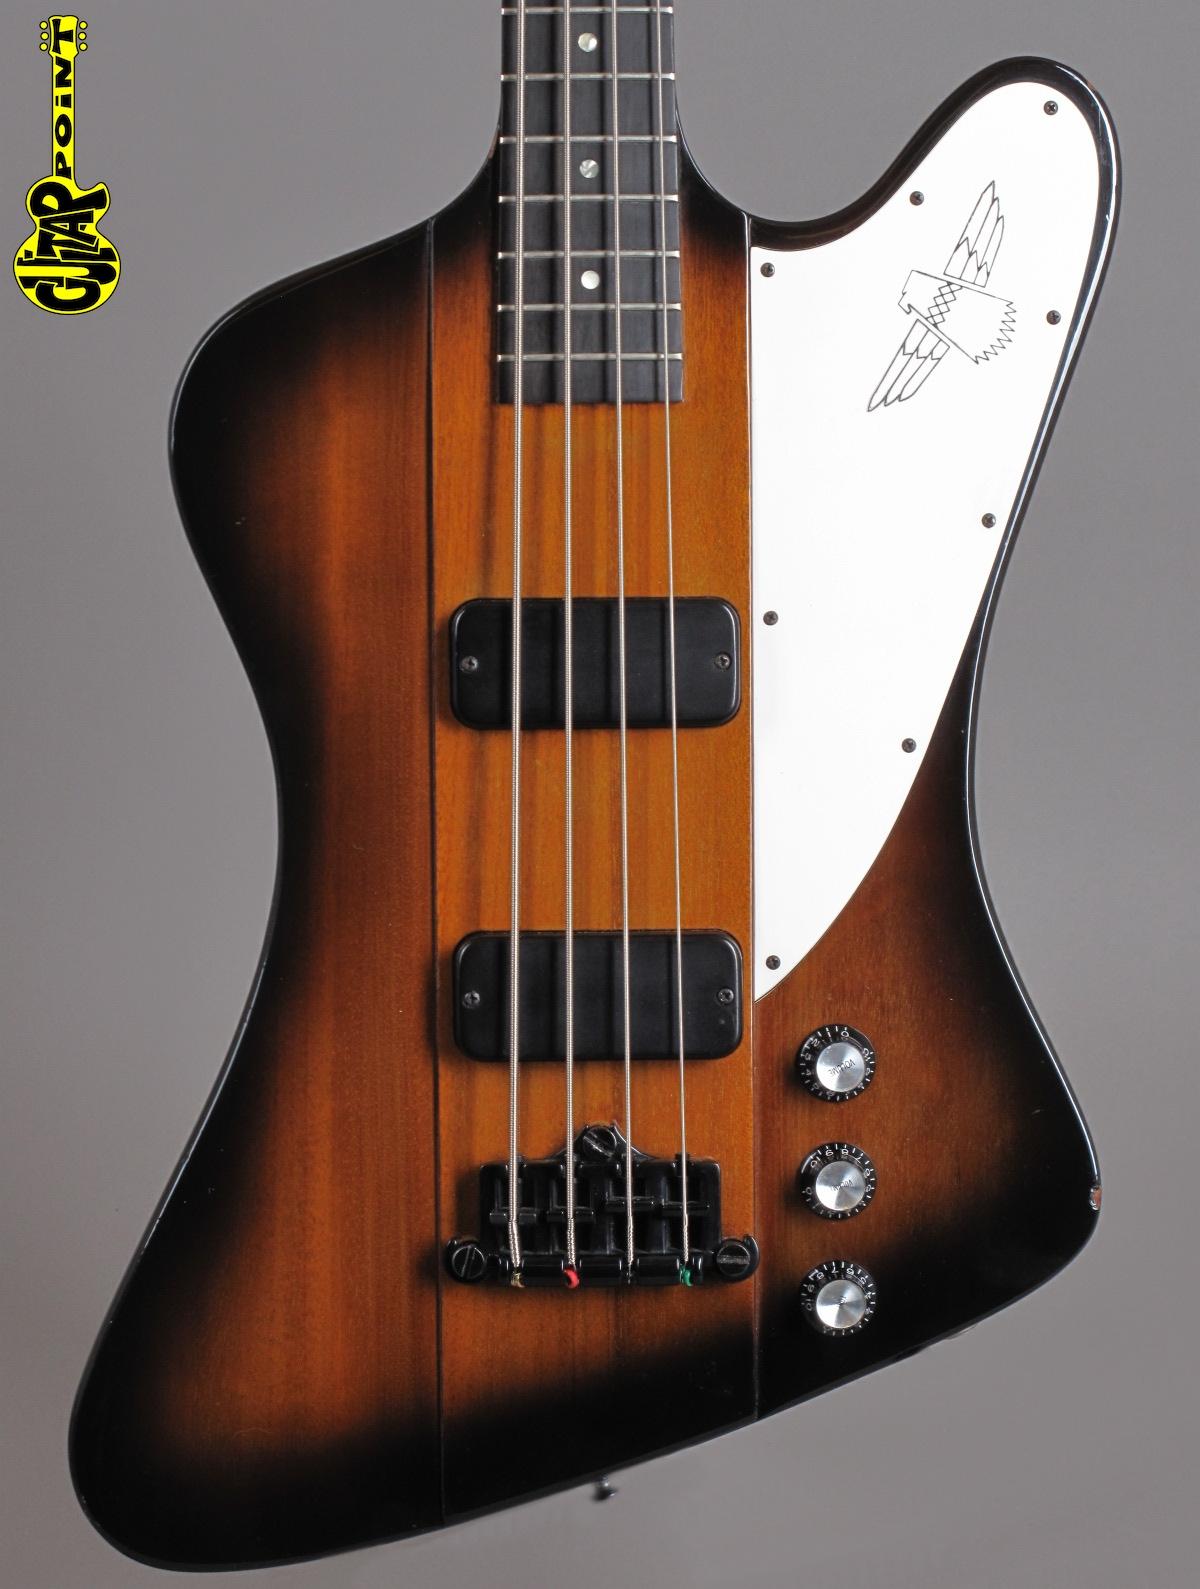 1989 Gibson Thunderbird IV Reverse Bass - Sunburst